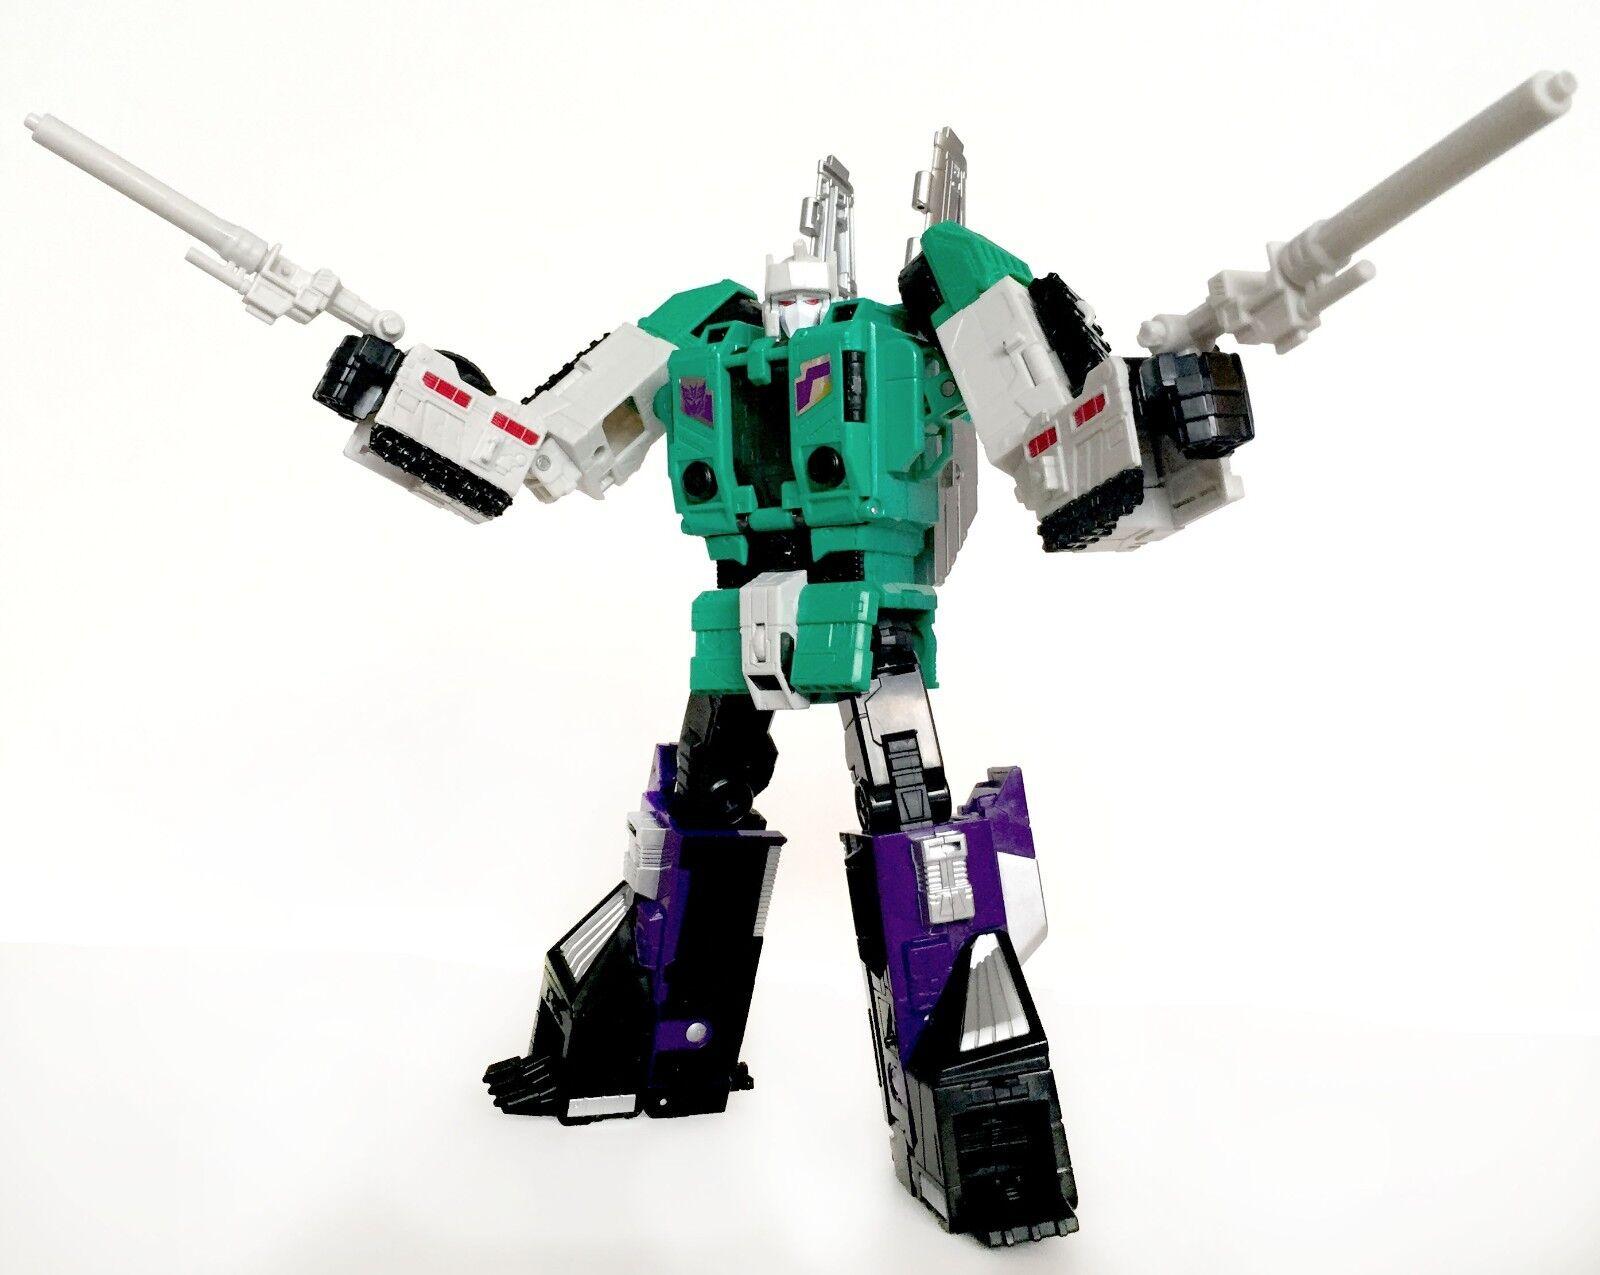 Transformers Hasbro Titan Returns Leader class Sixshot